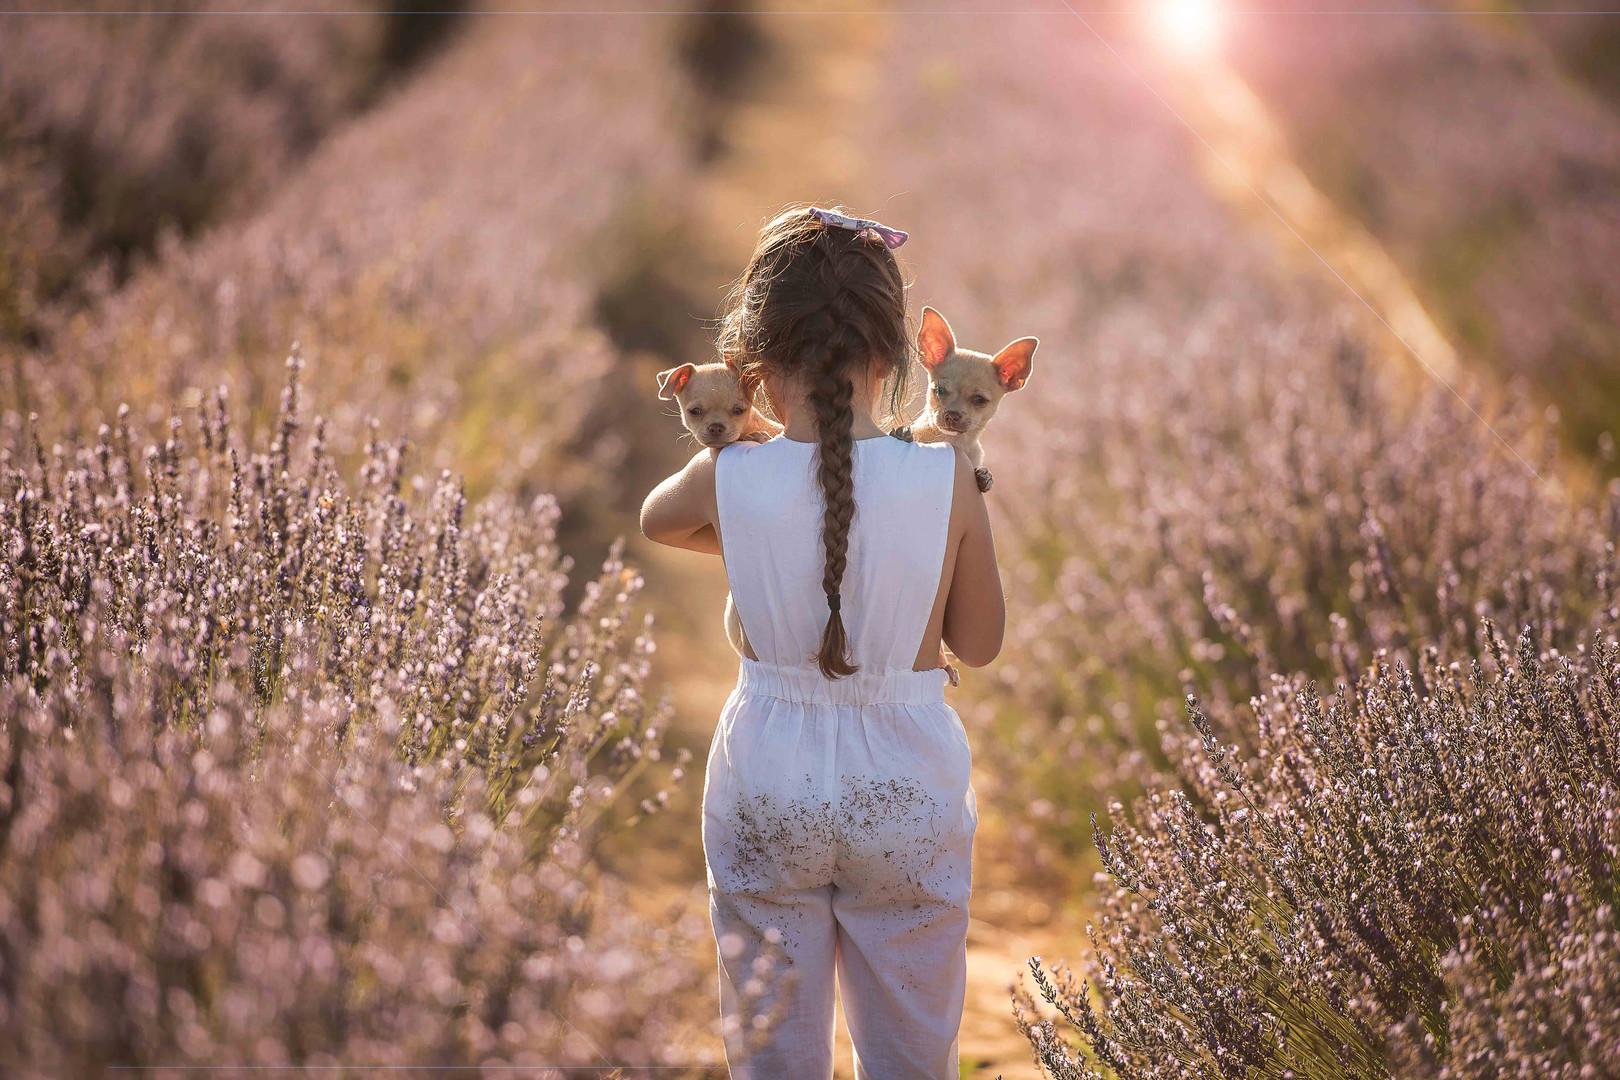 Yanchep lavender farm young girl with puppy, Perth WA